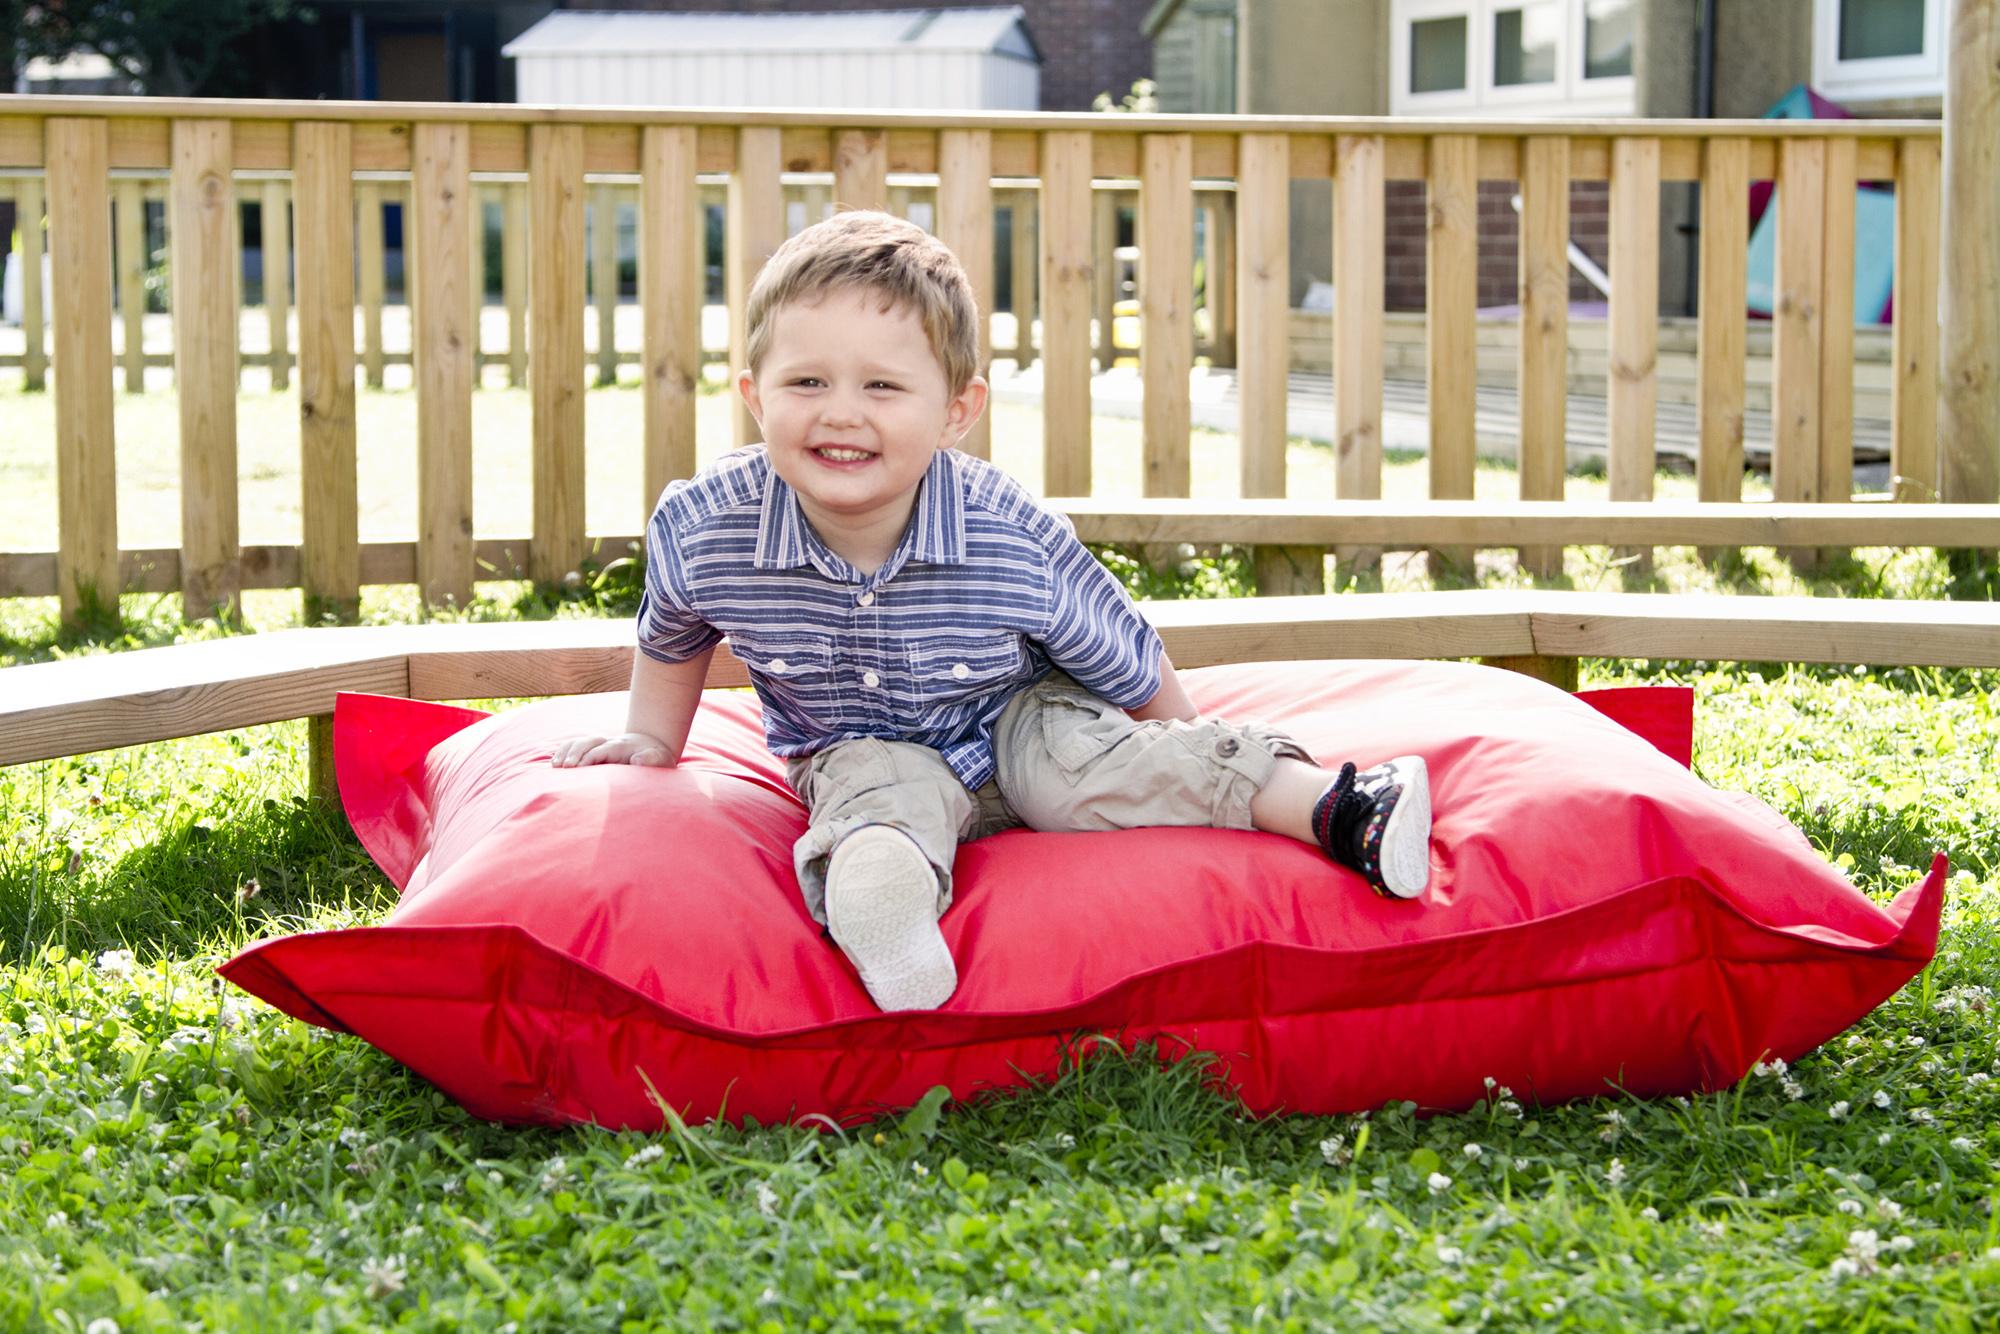 Eden-Childrens-Giant-Cushion-LF-300dpi-2